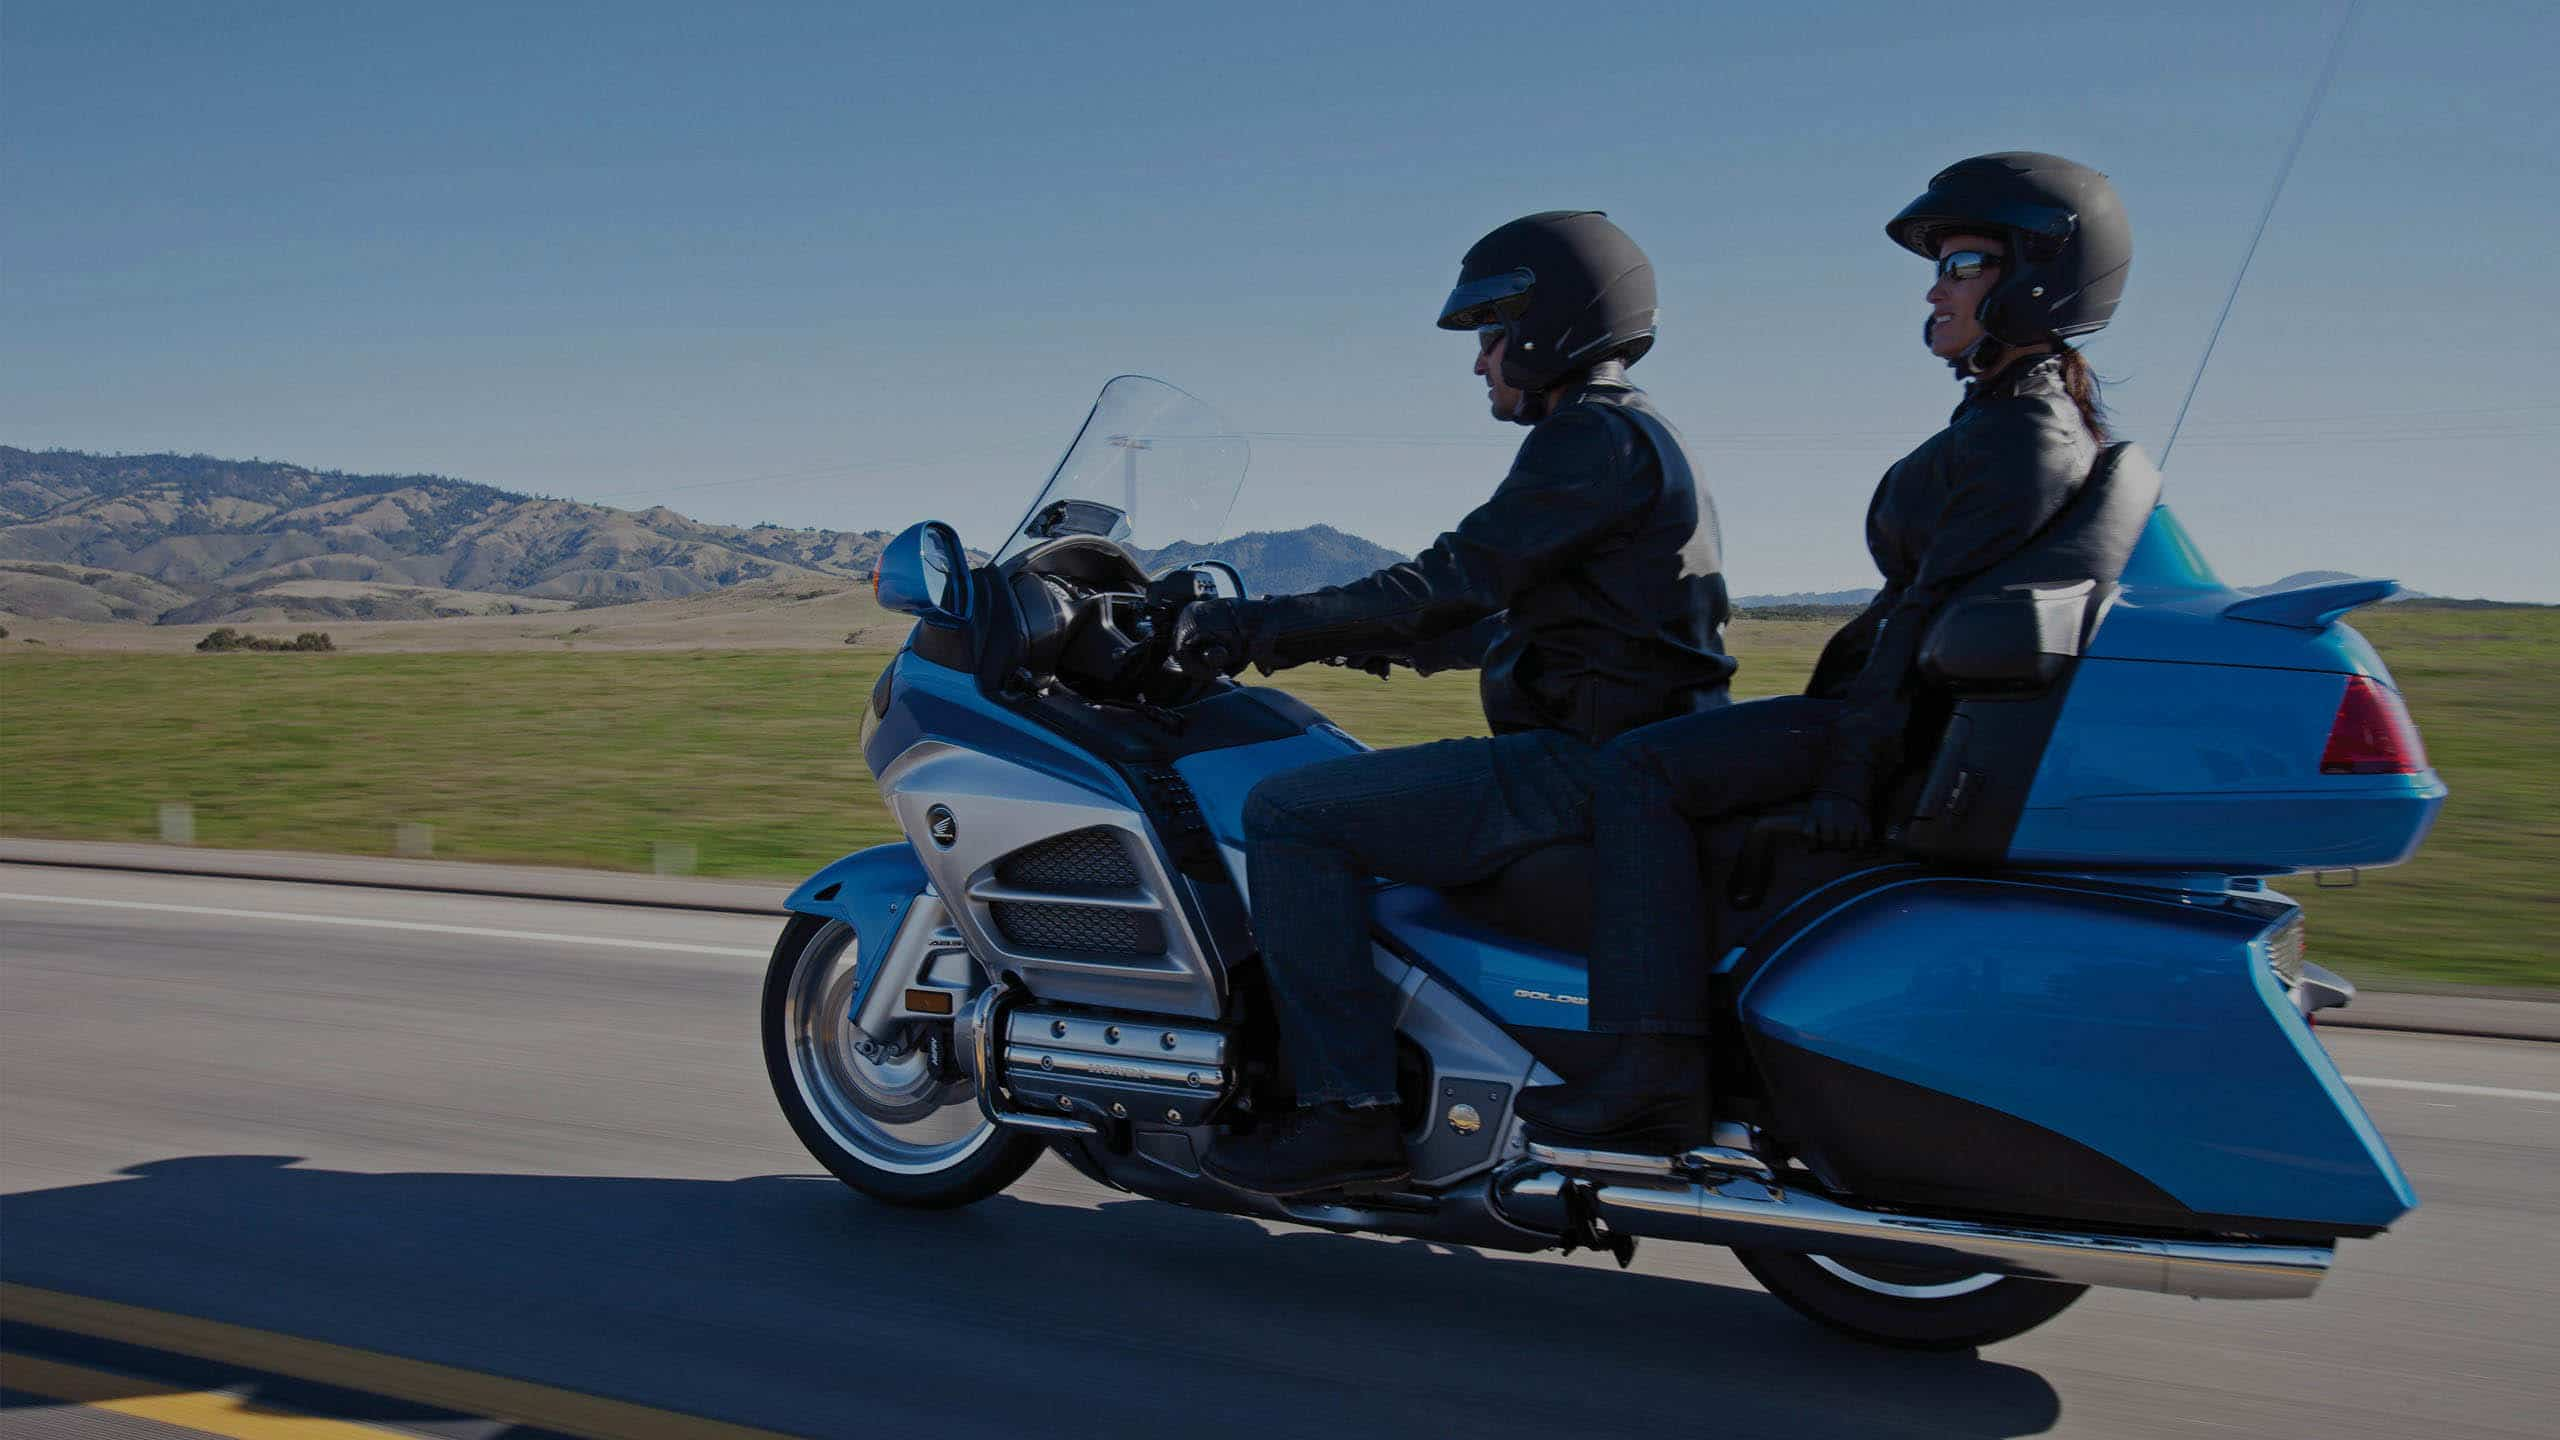 Moto Honda Goldwing avec chauffeur et passager